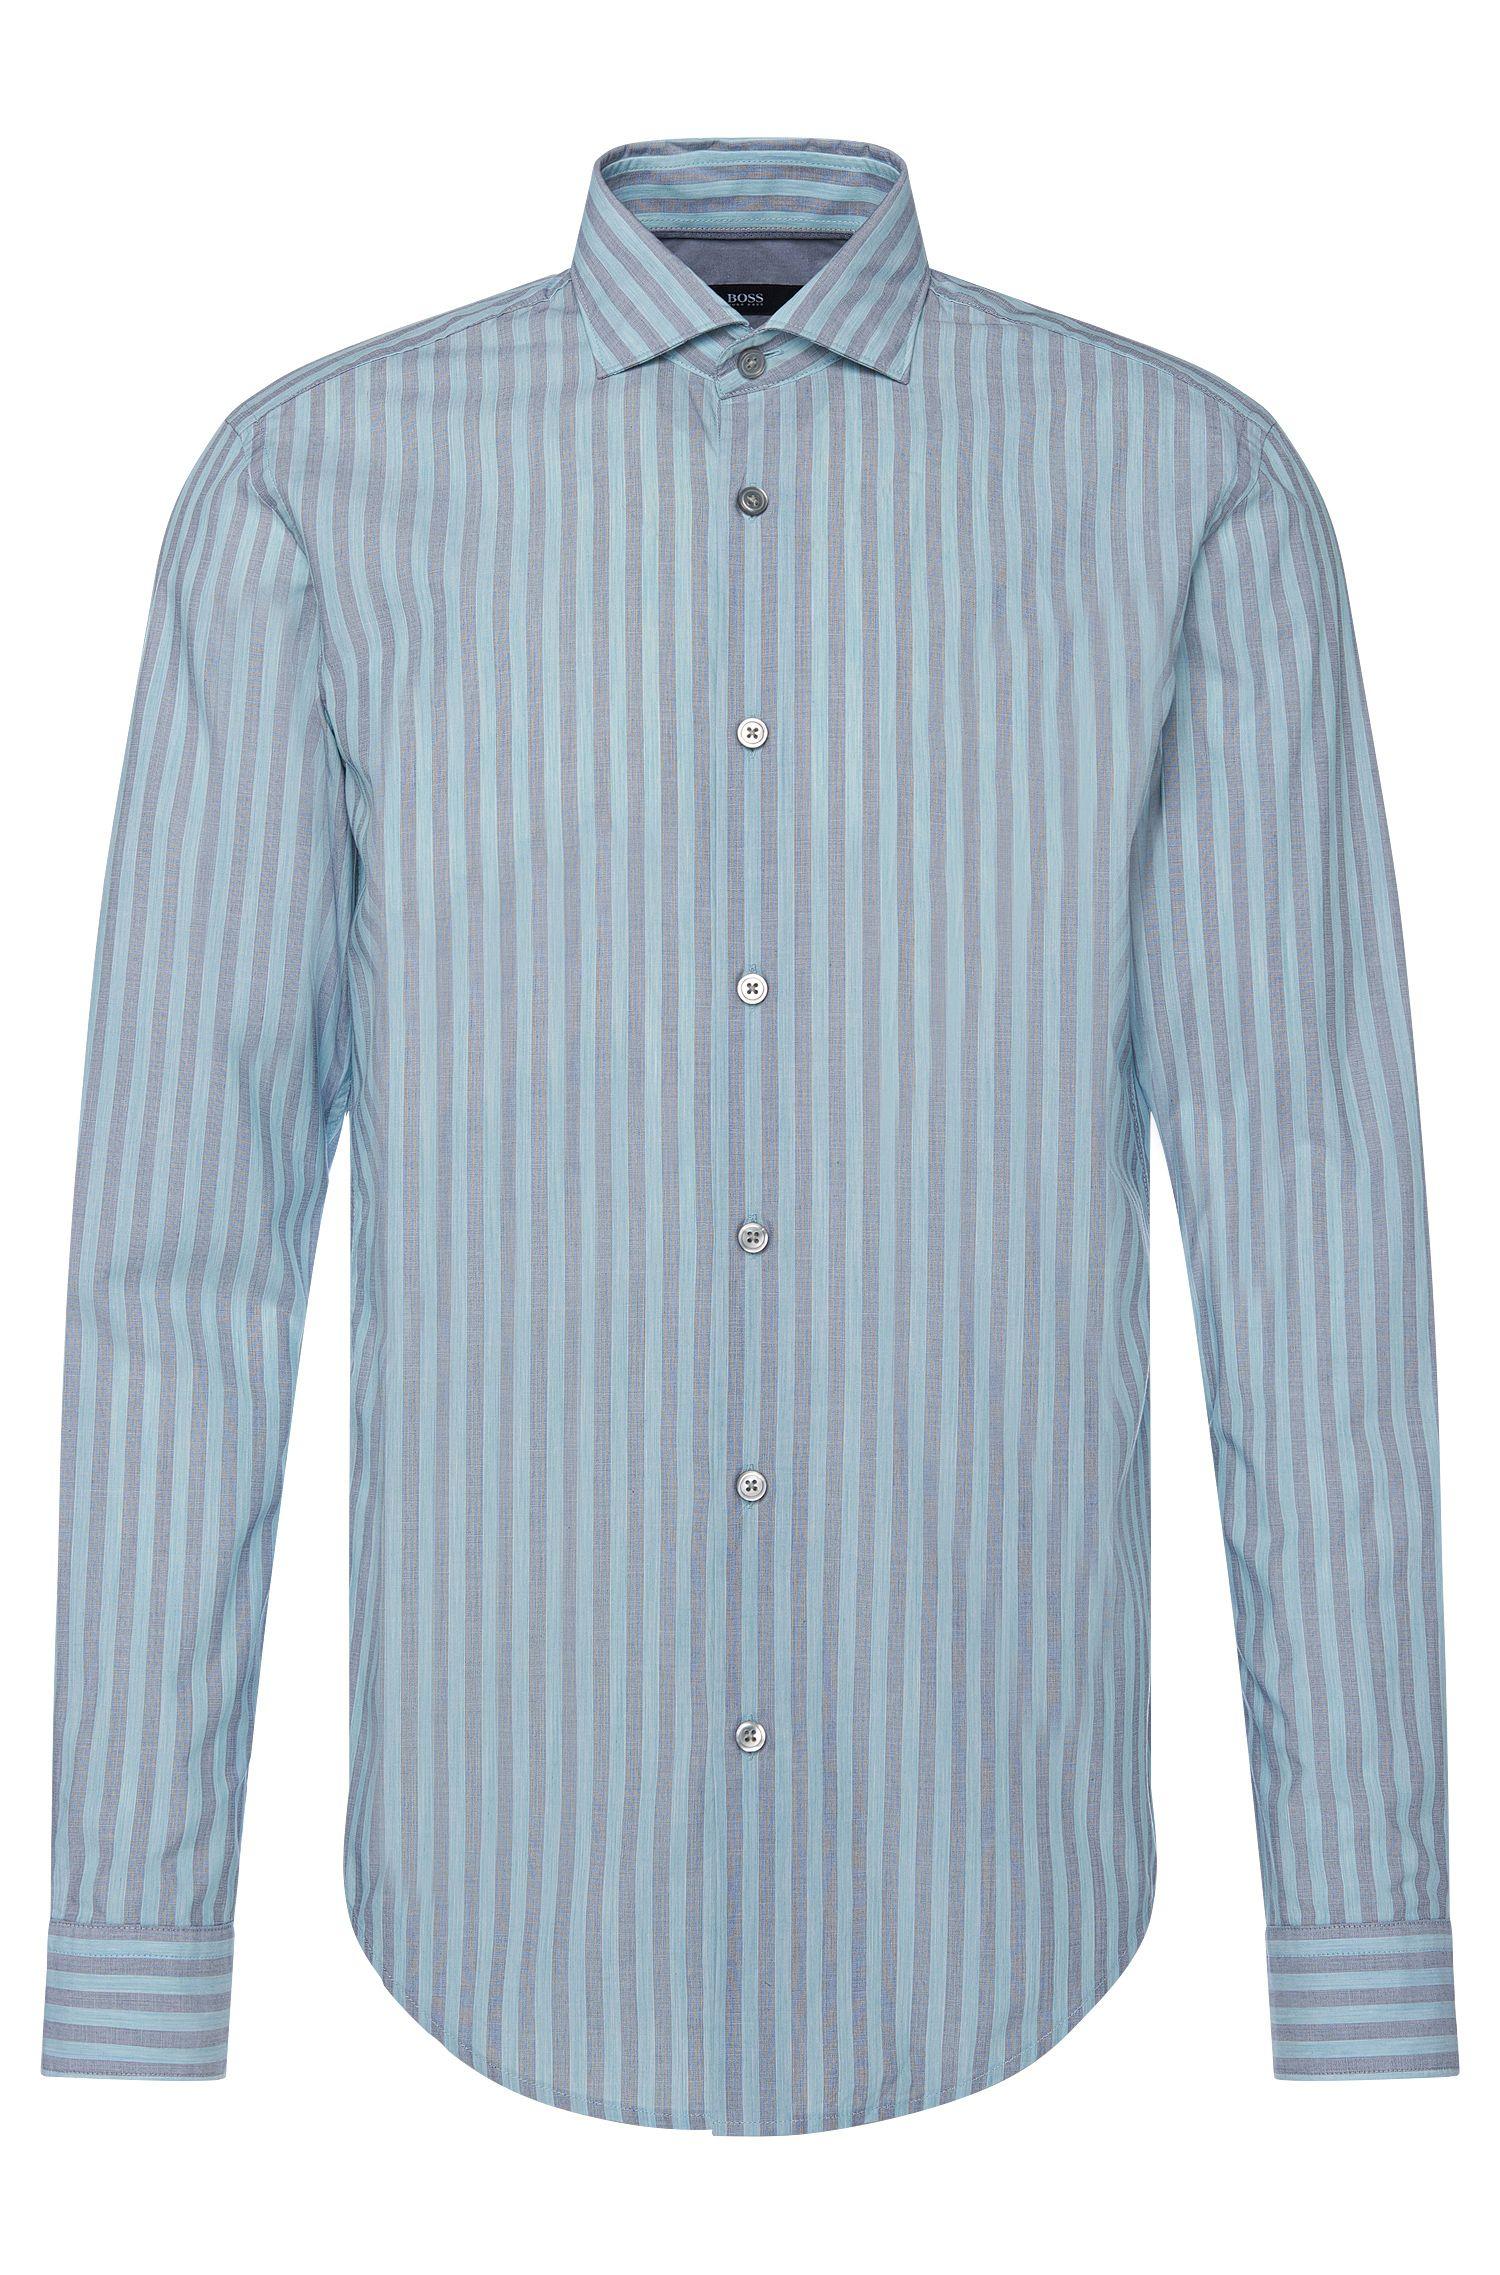 Cotton Striped Button Down Shirt, Slim Fit | Ridley, Open Green